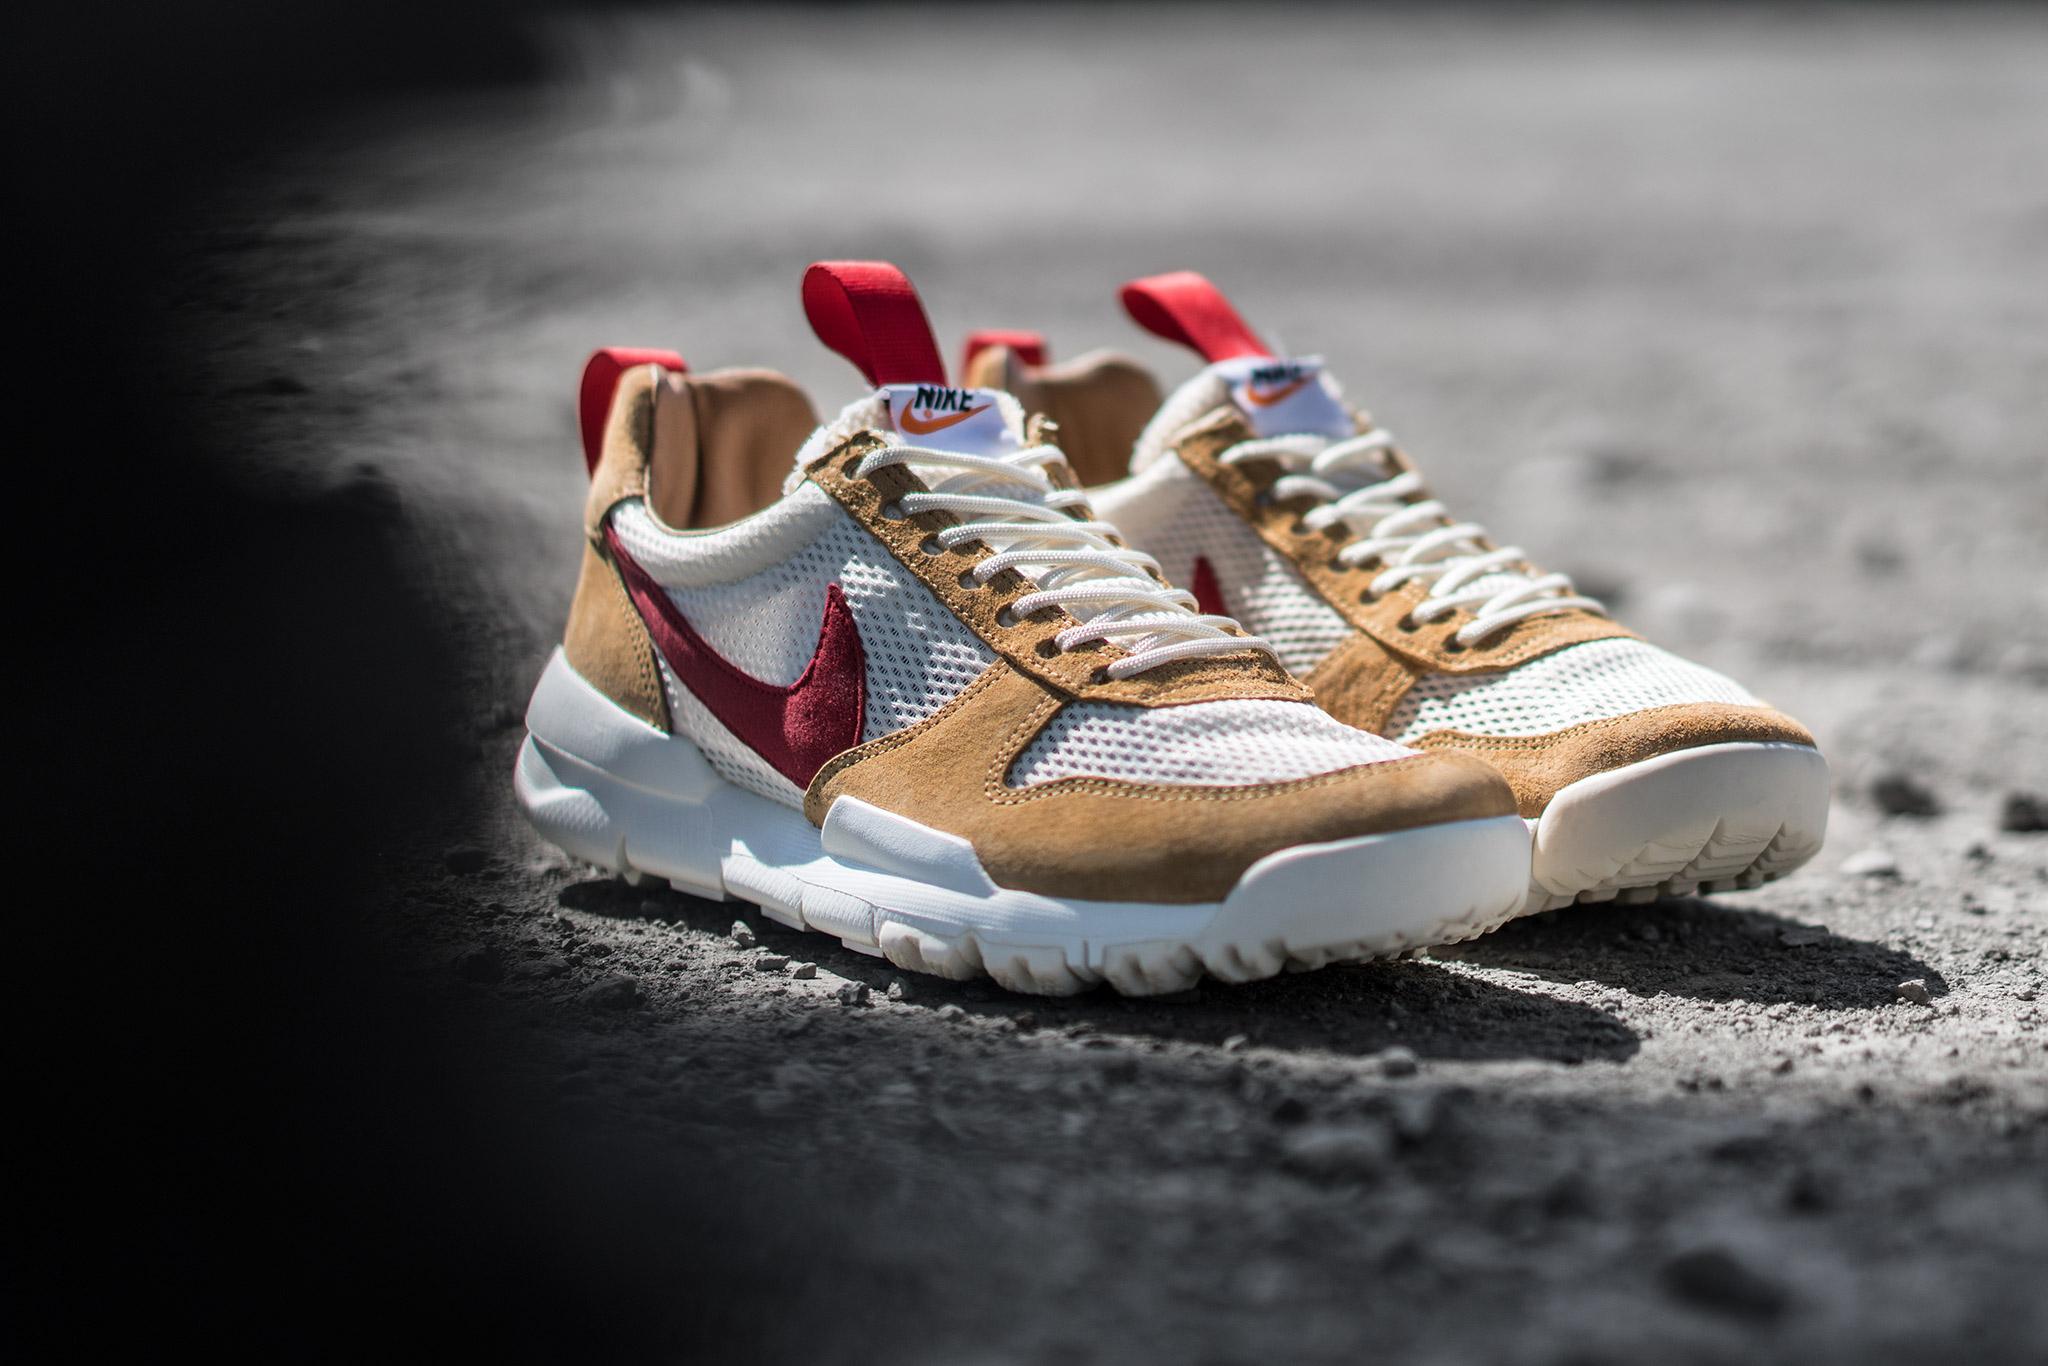 Les 10 meilleures Sneakers de 2017 – N°X: La Nikecraft Tom